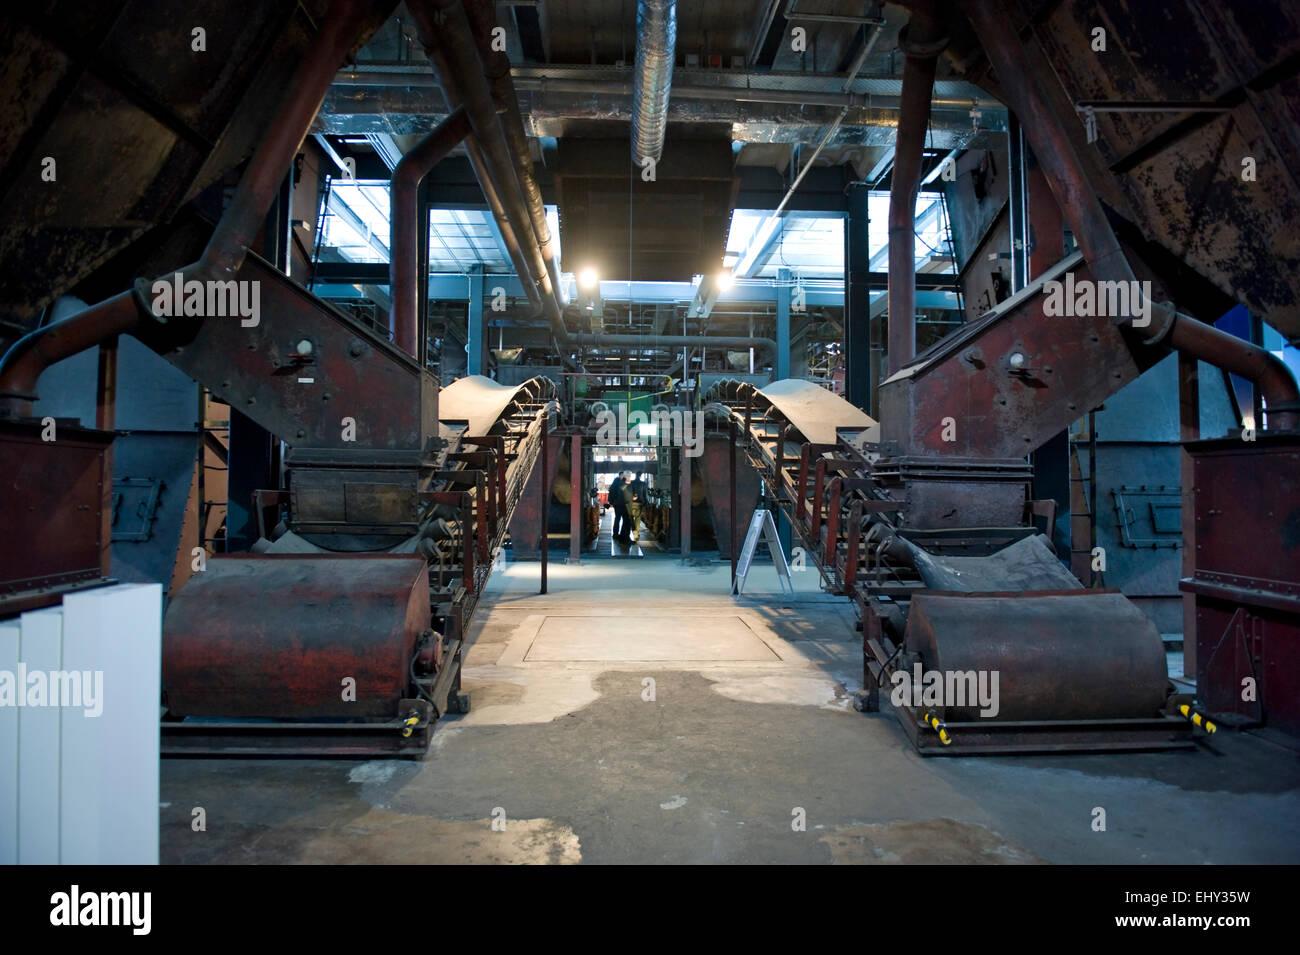 Visitor area of the Ruhr Museum Zeche Zollverein World Heritage Site in Essen, North Rhine-Westphalia, Germany, - Stock Image